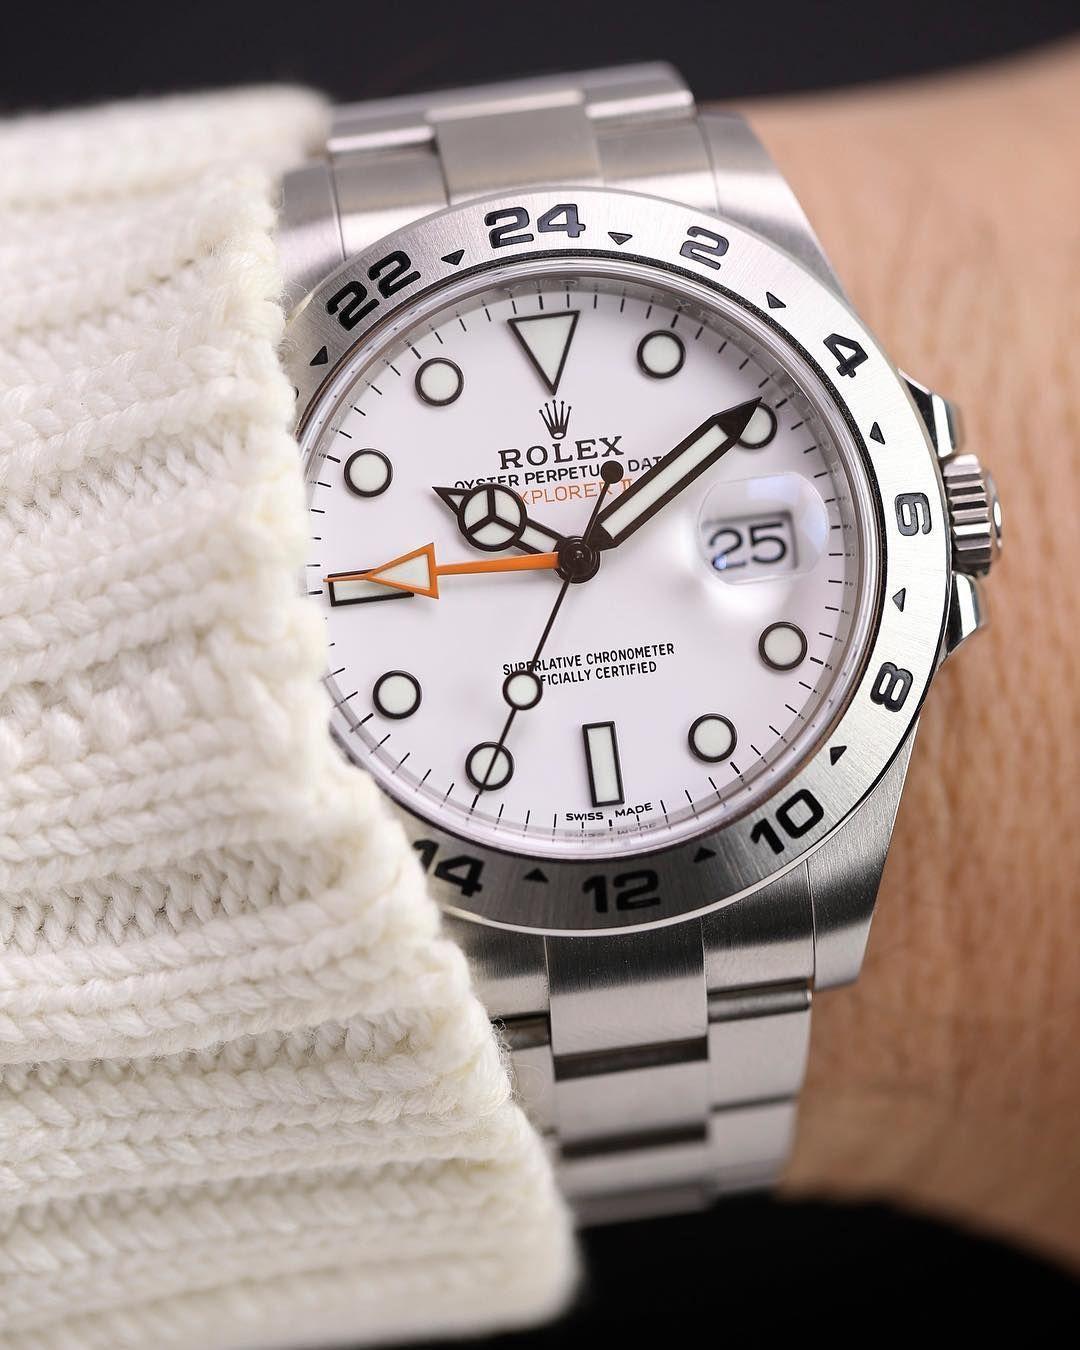 86c4d133a75 Rolex Explorer II 216570 Relógios Rolex